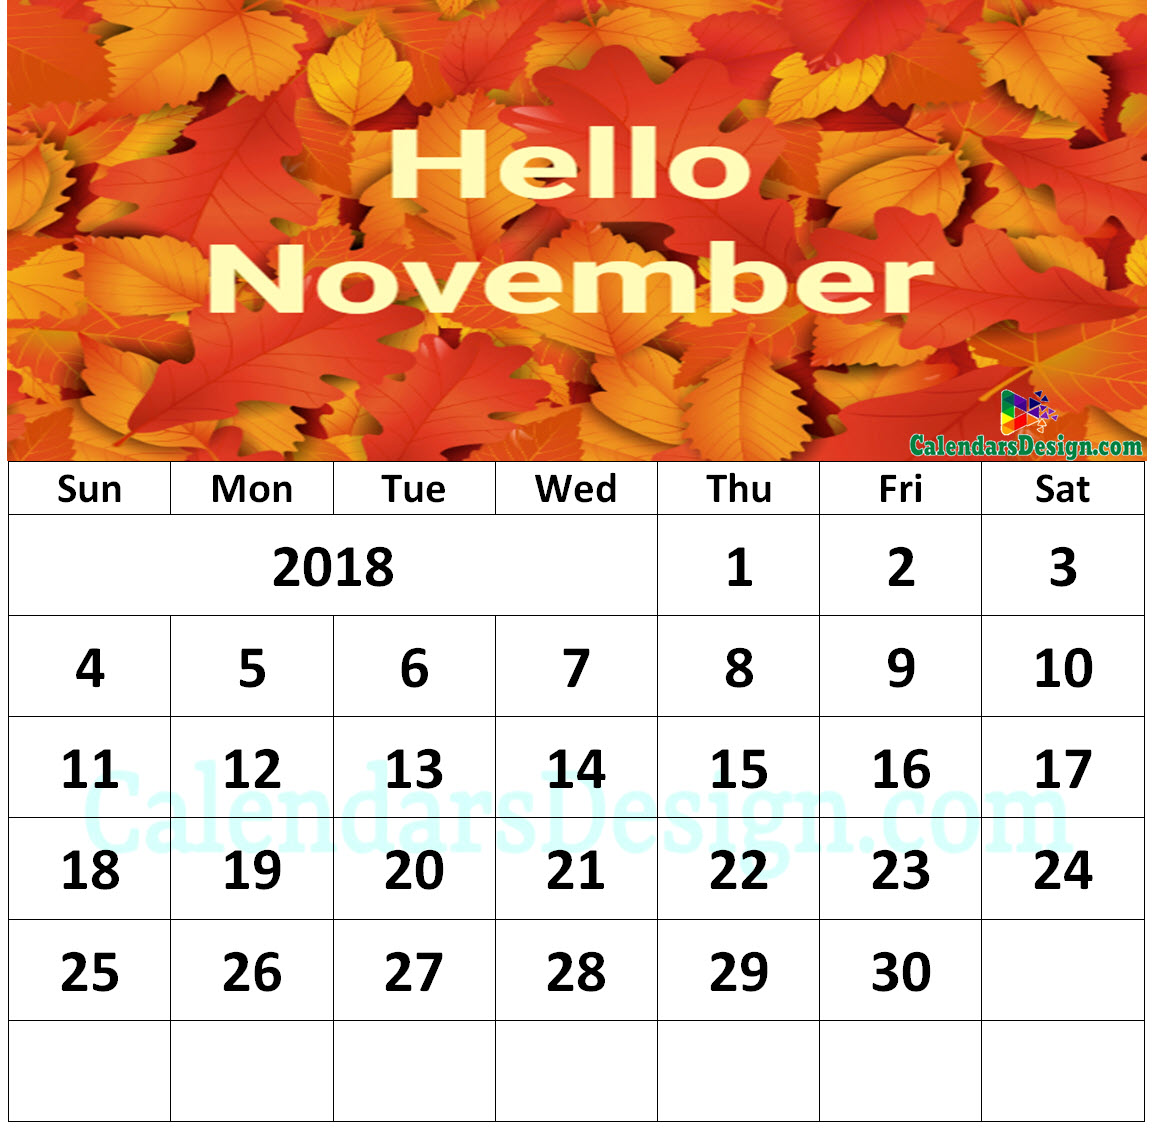 Floral November 2018 Wall Calendar